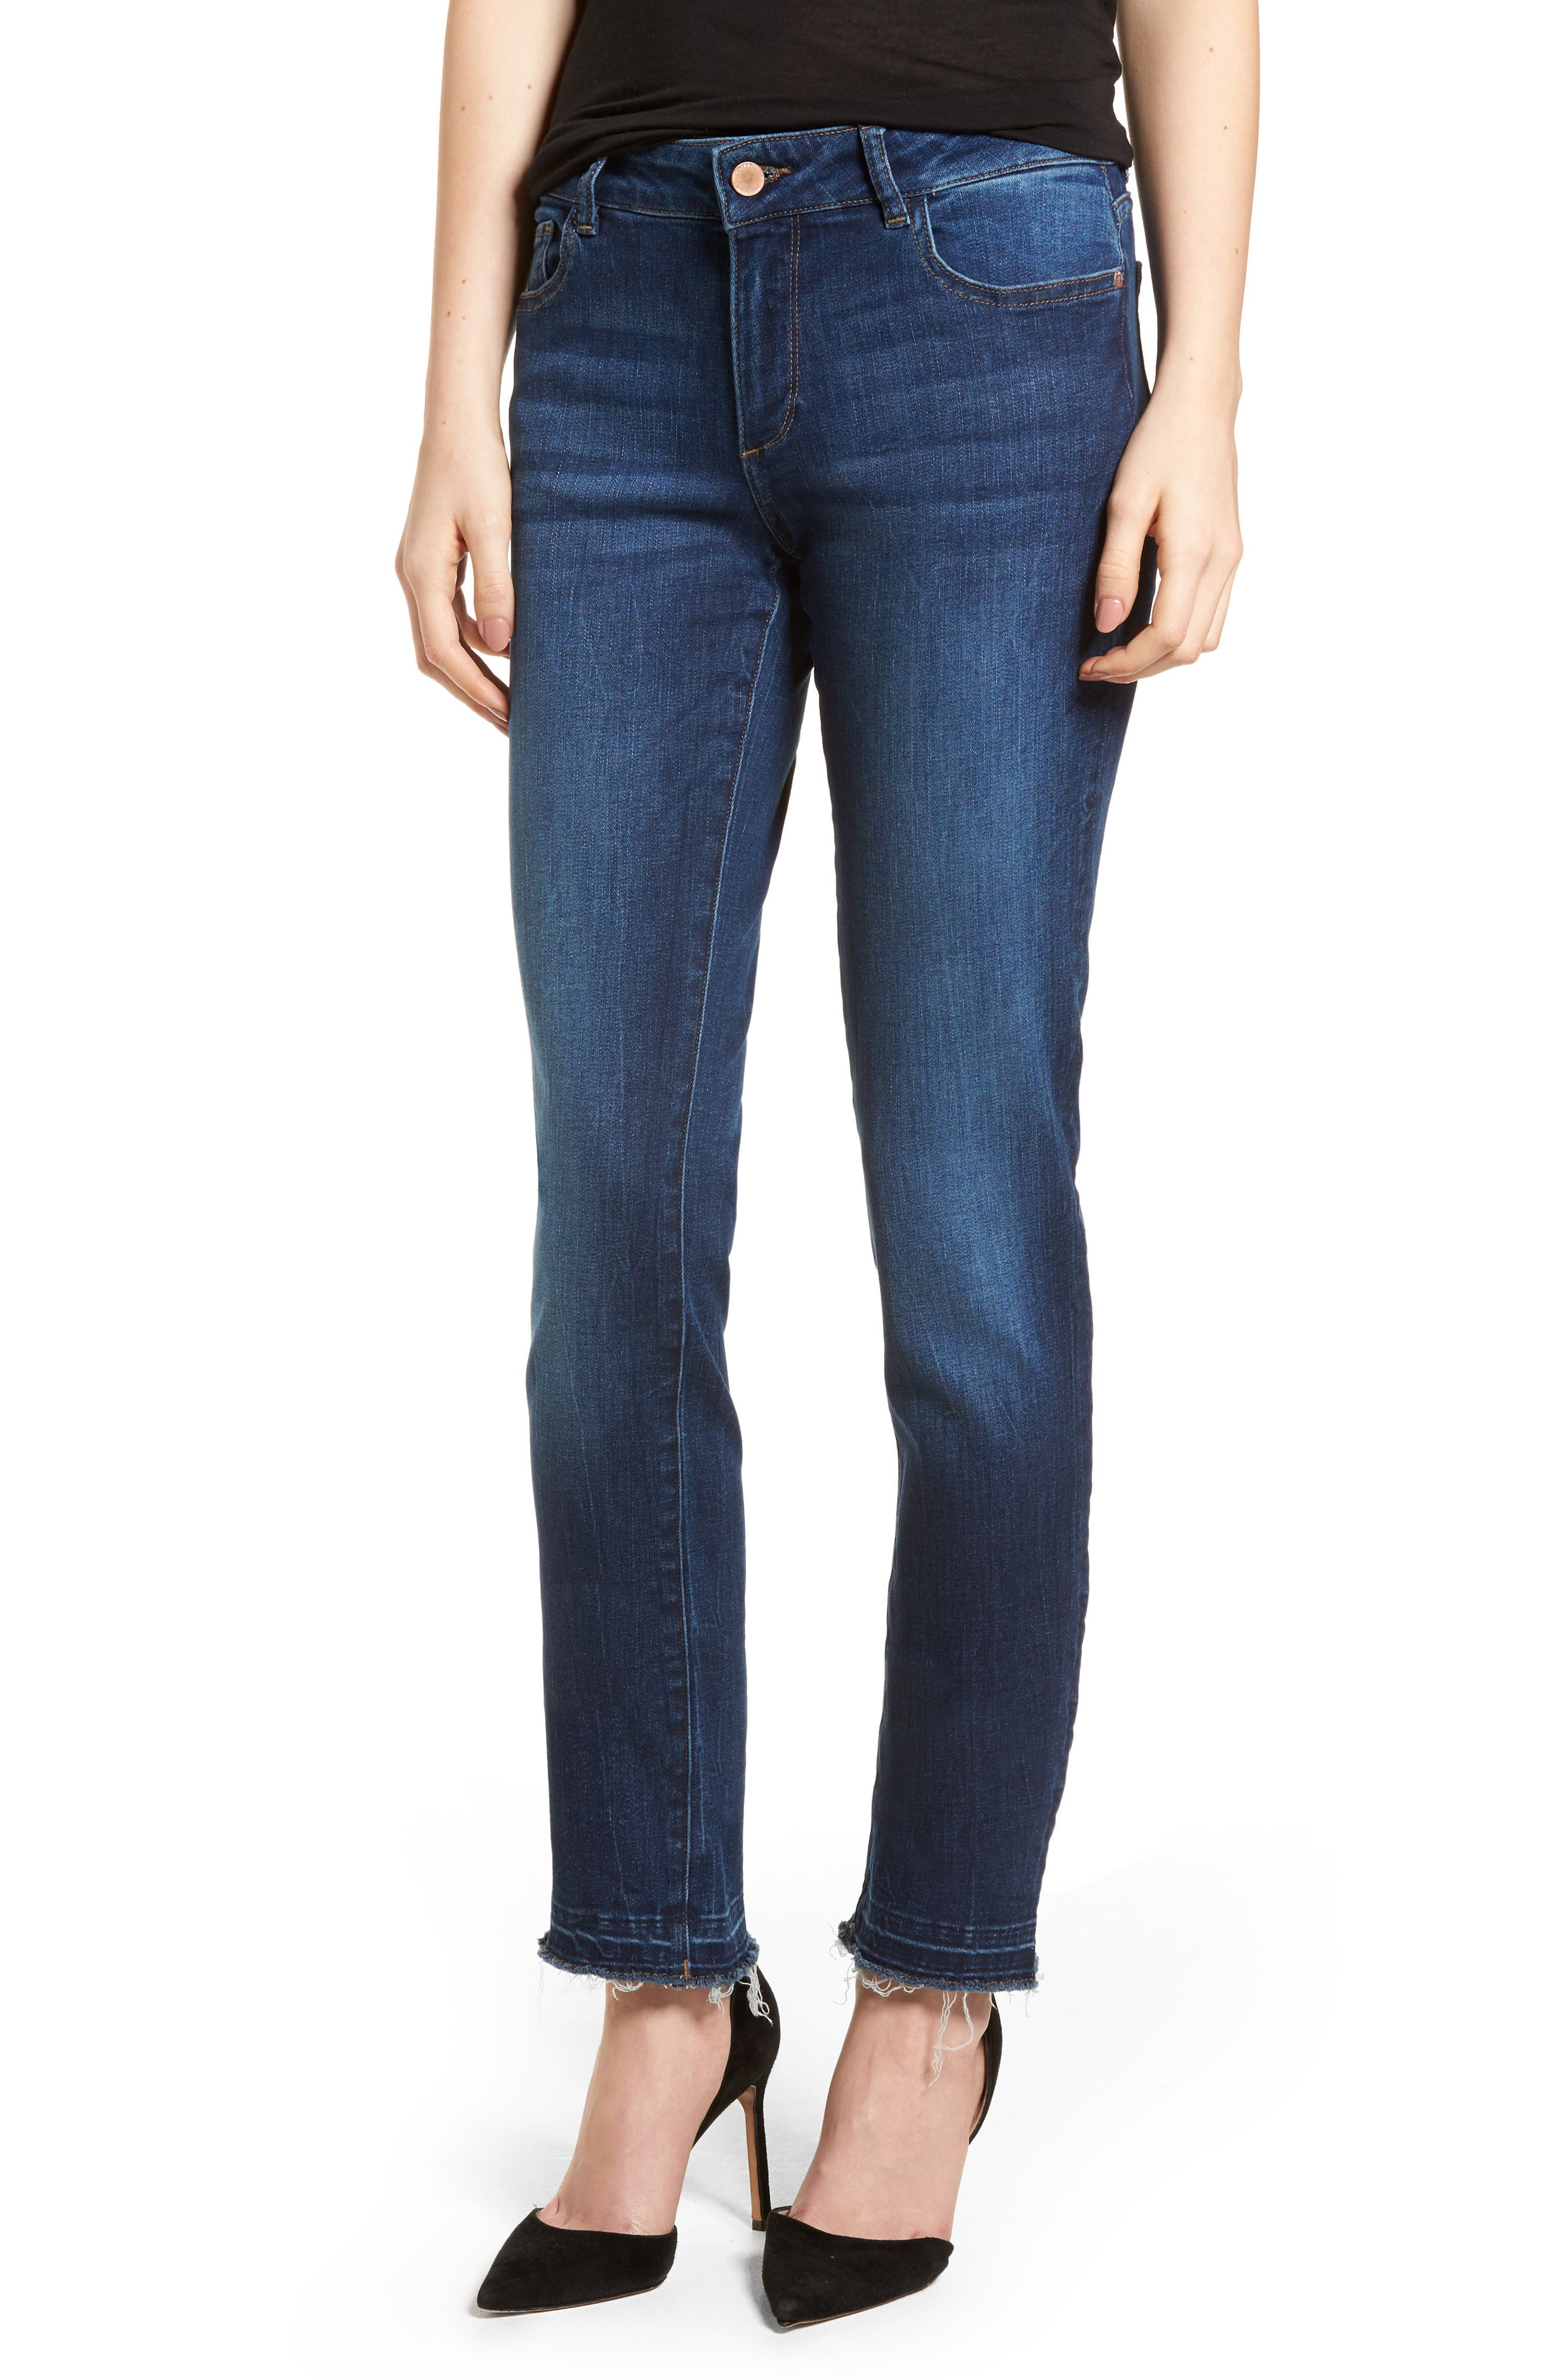 Coco Curvy Slim Straight Leg Jeans,                             Main thumbnail 1, color,                             405